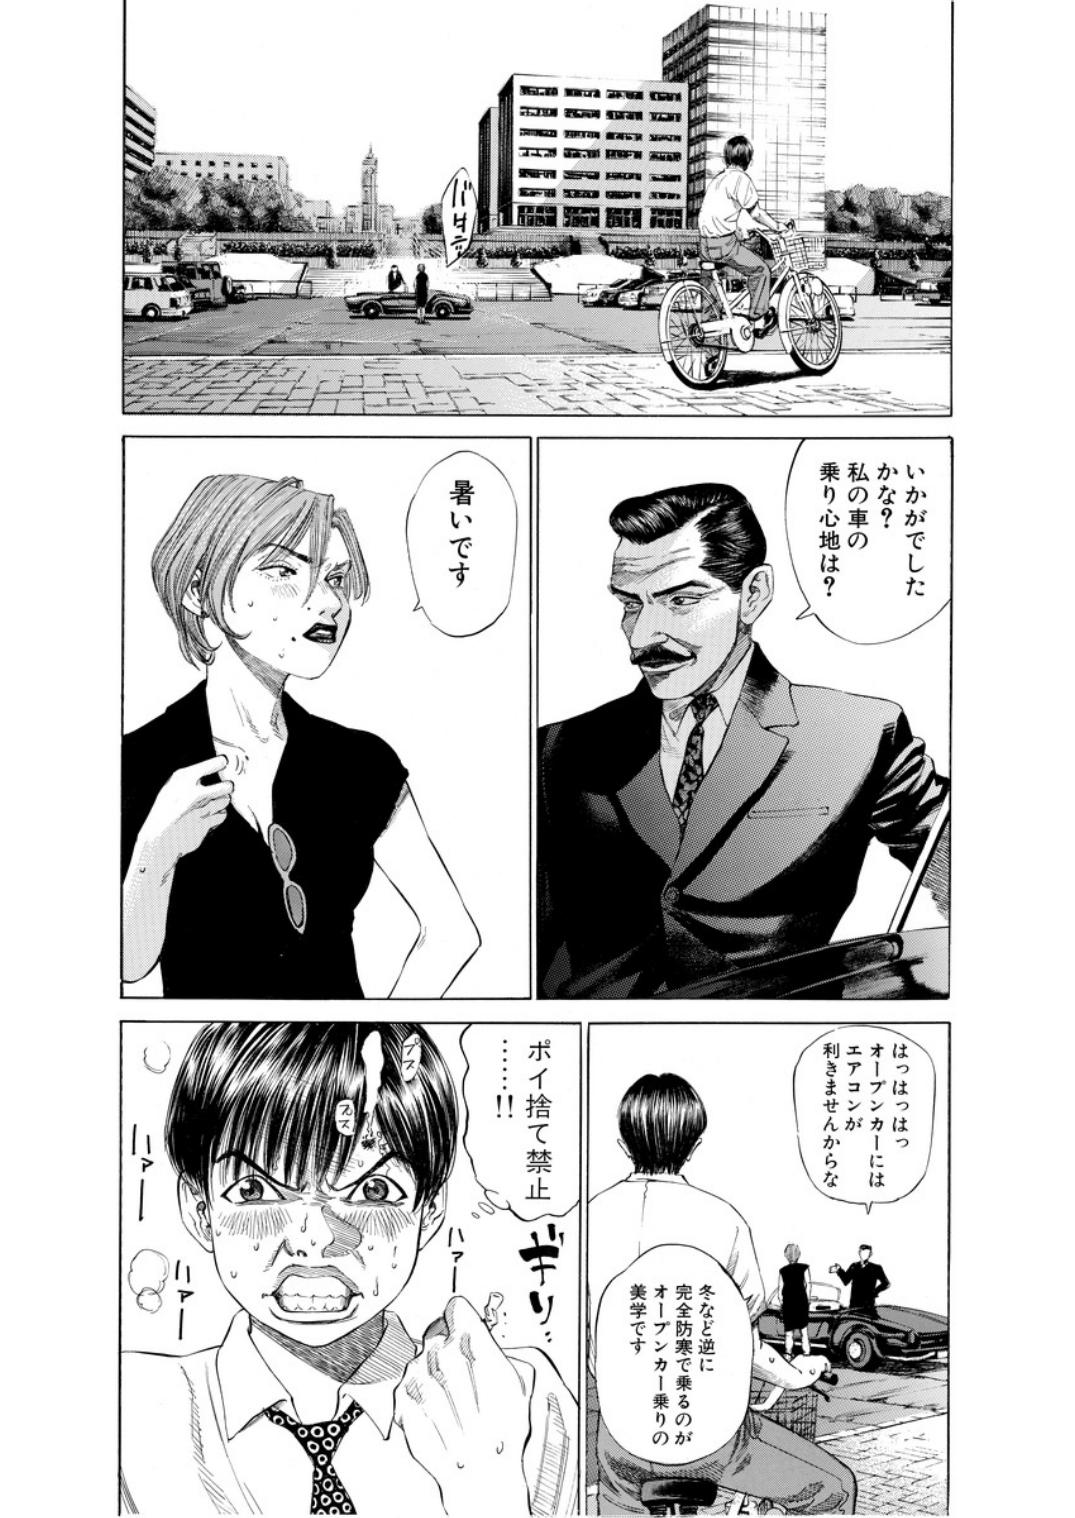 001bj_page-0191.jpg